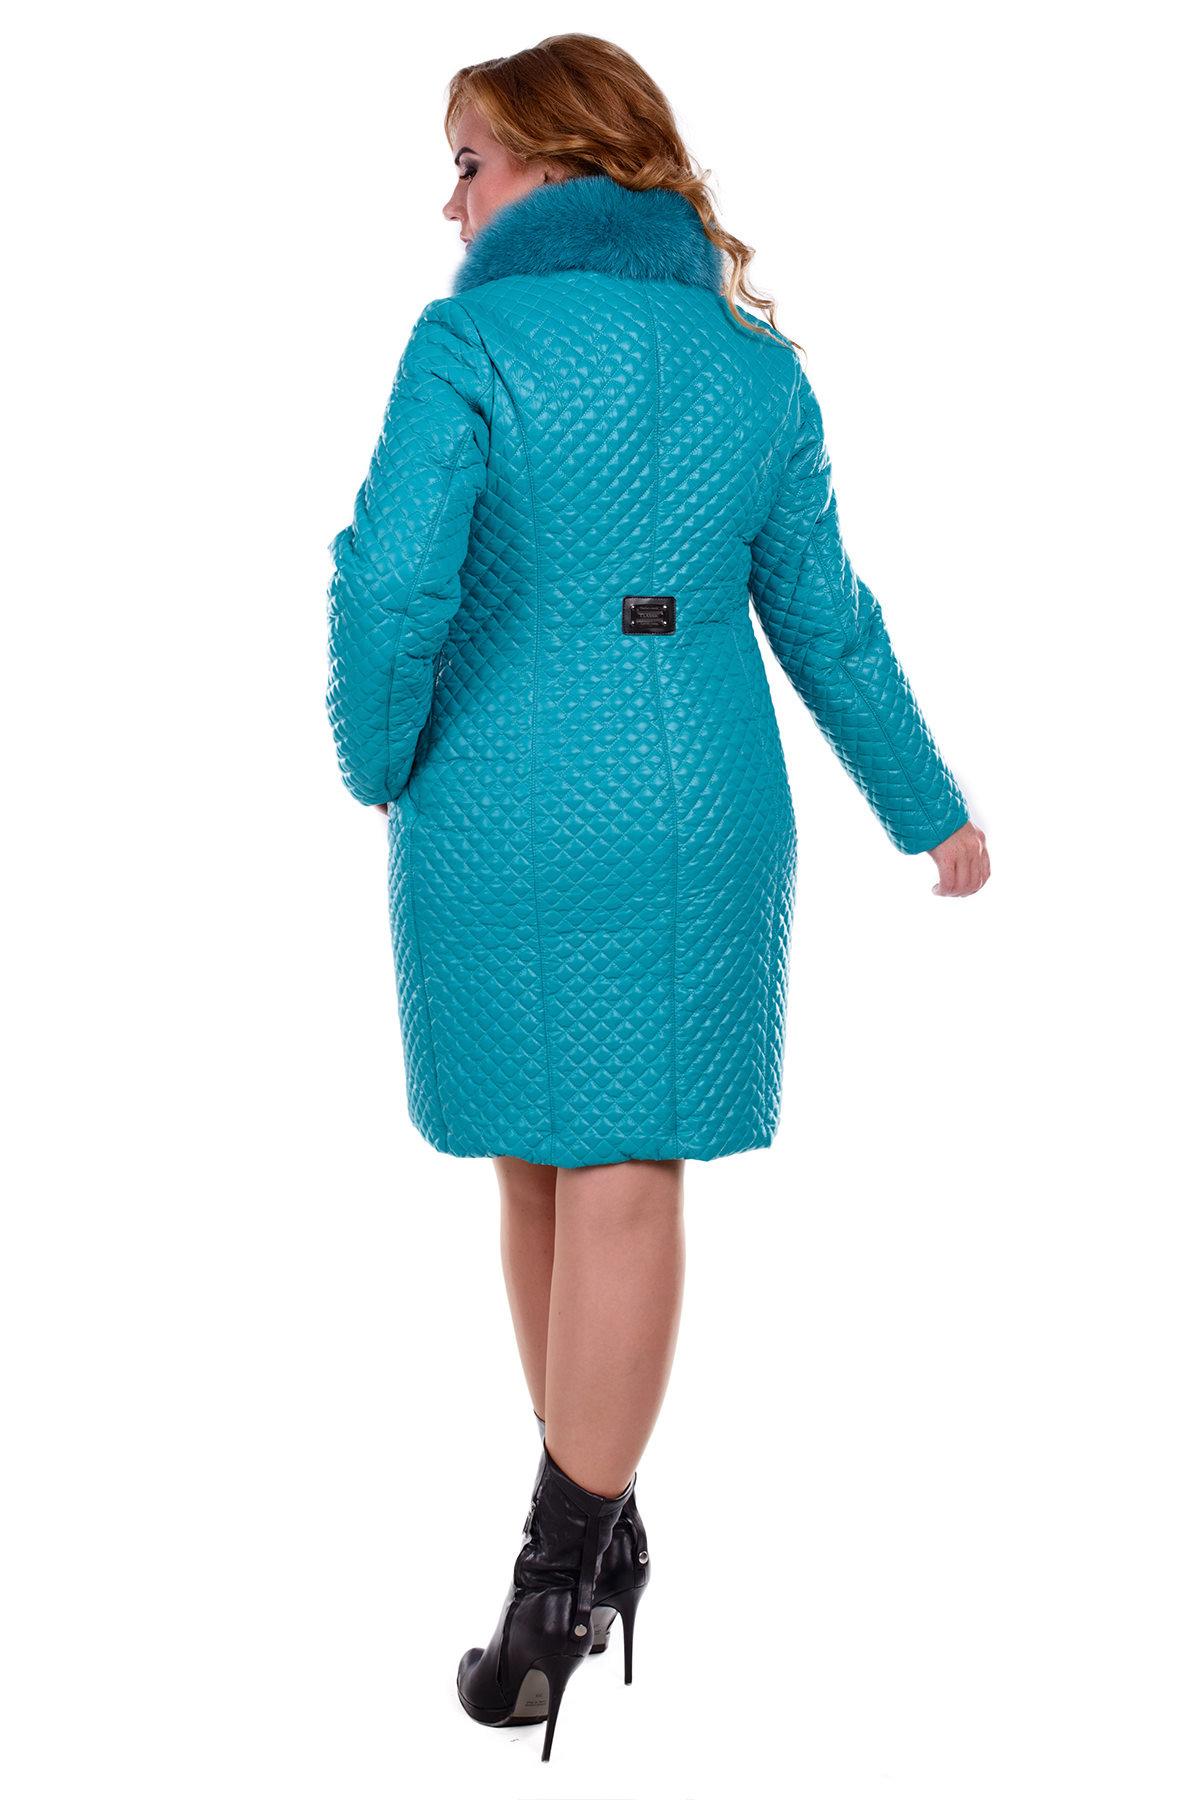 Пальто Donna зима Андрия 0317 Цвет: Бирюза